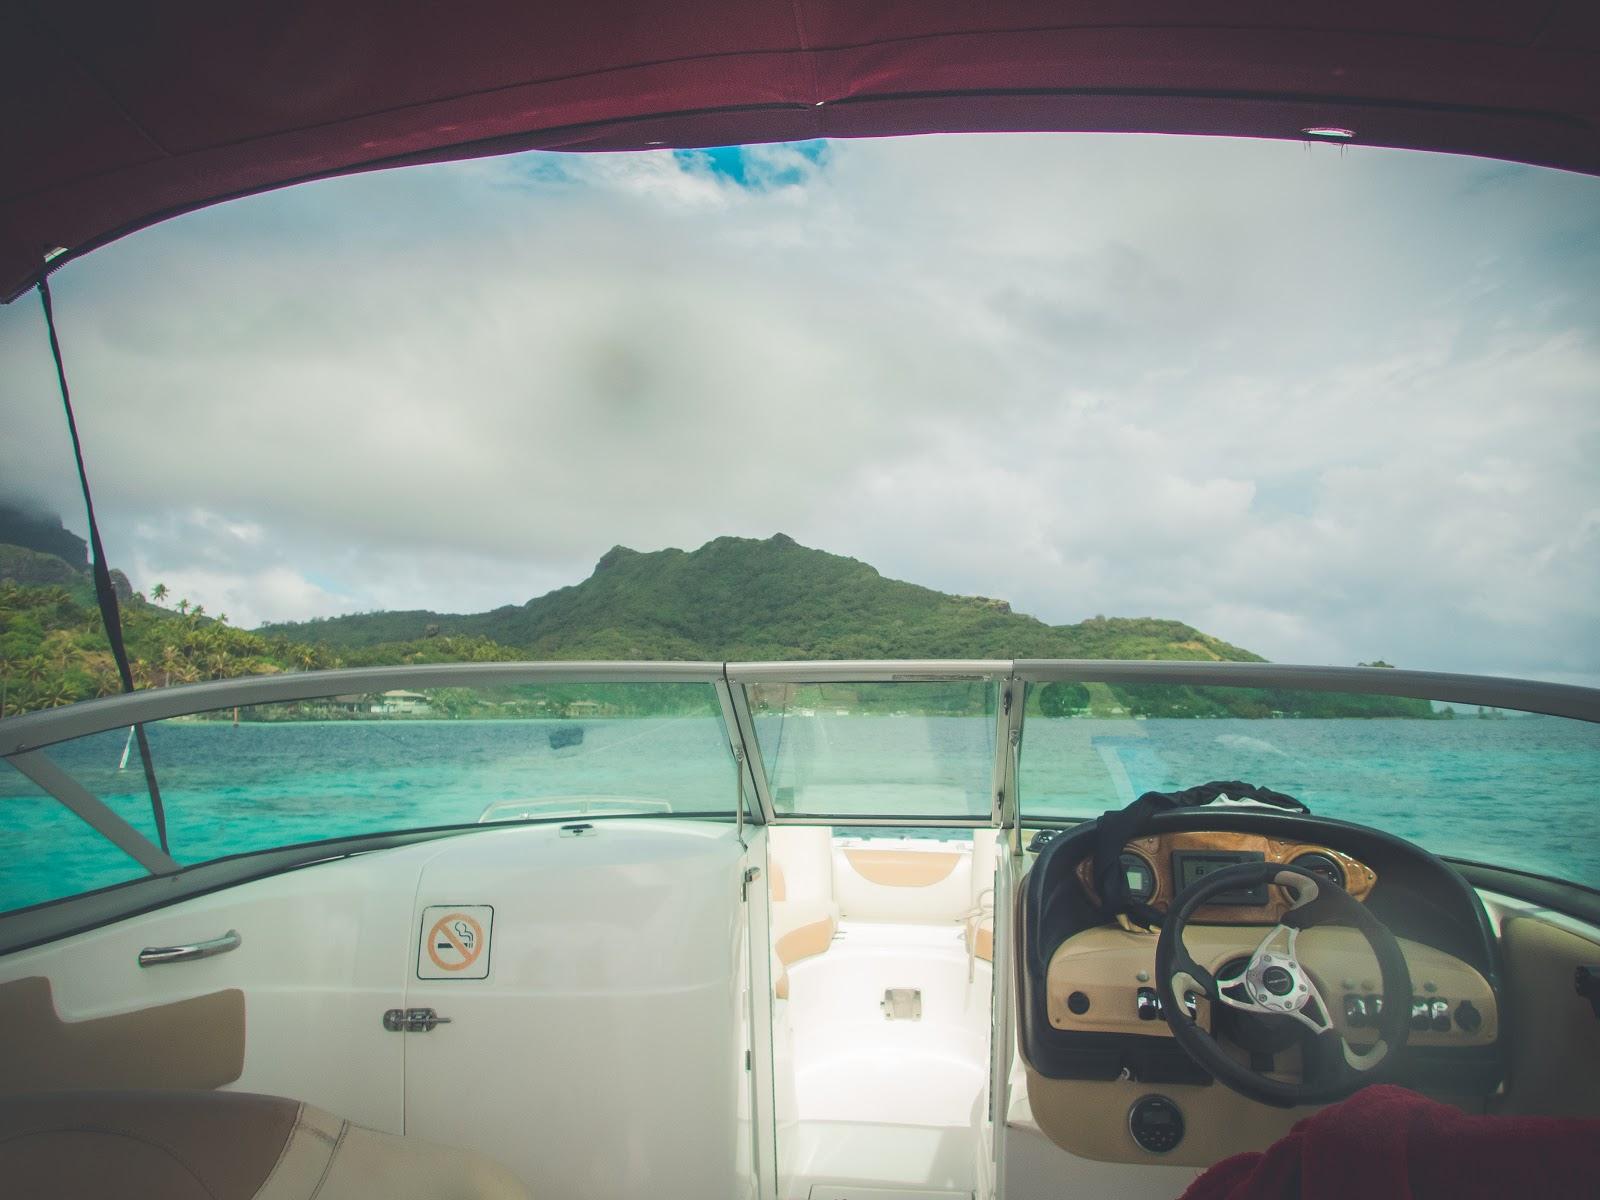 Tahiti Bora Bora|Pure Snorkeling @Aquarium Snorkeling Location